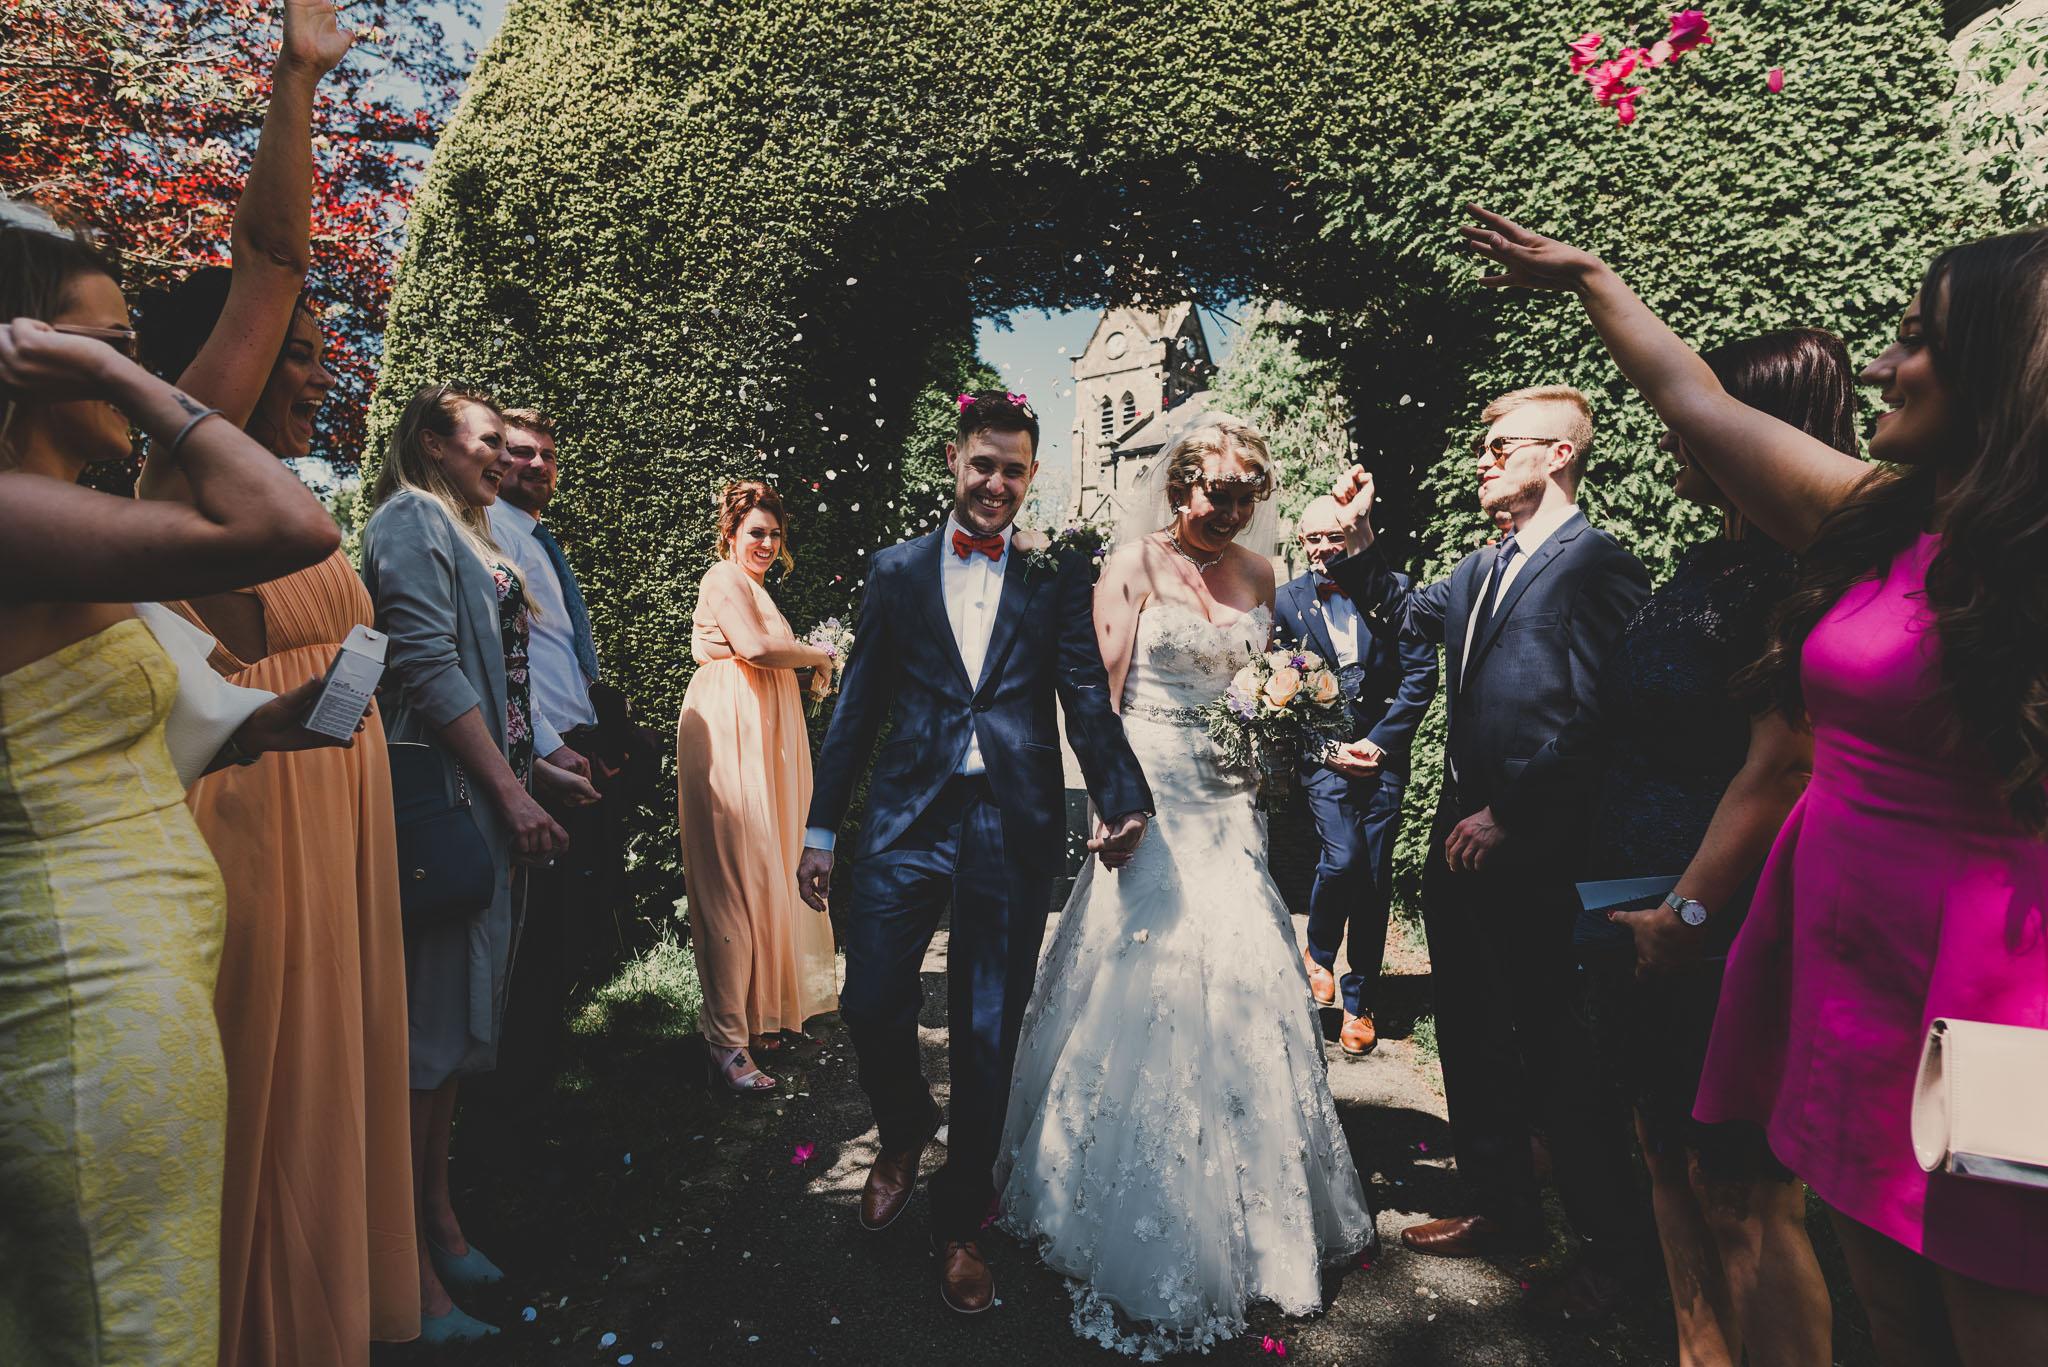 2 romantic and intimate wedding phtography (30).jpg